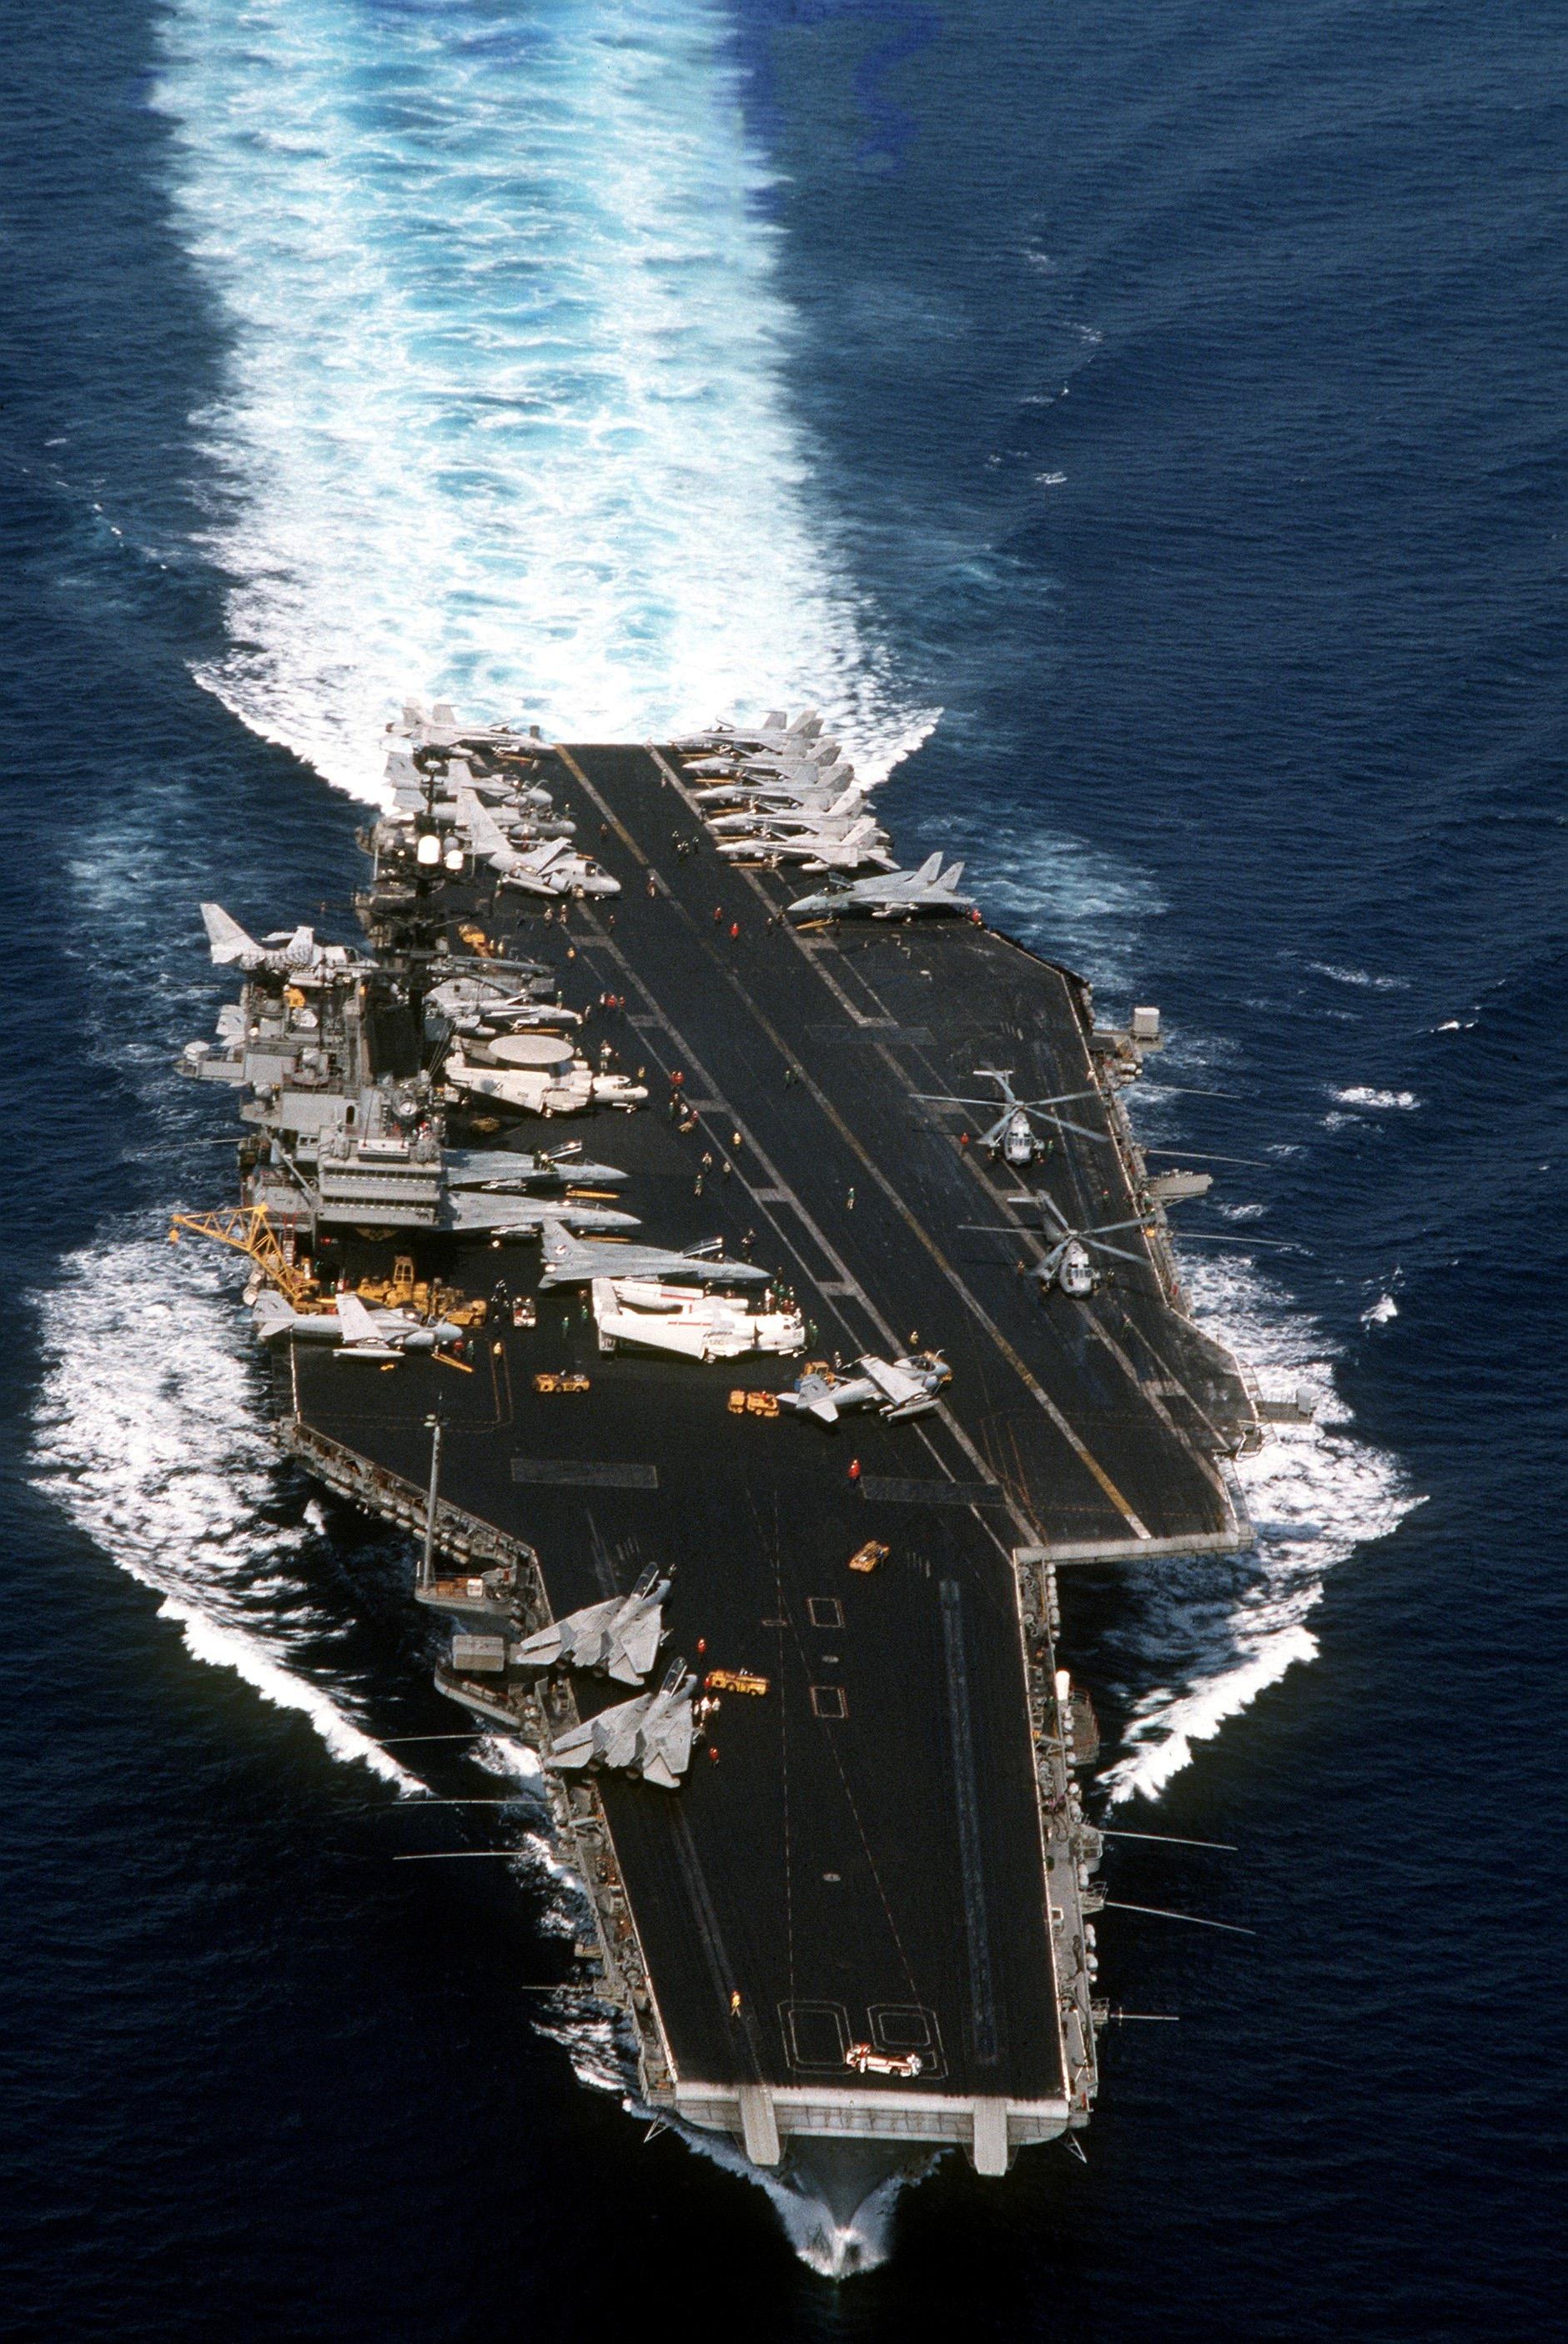 C 17 On Aircraft Carrier File:USS Saratoga (CV-...